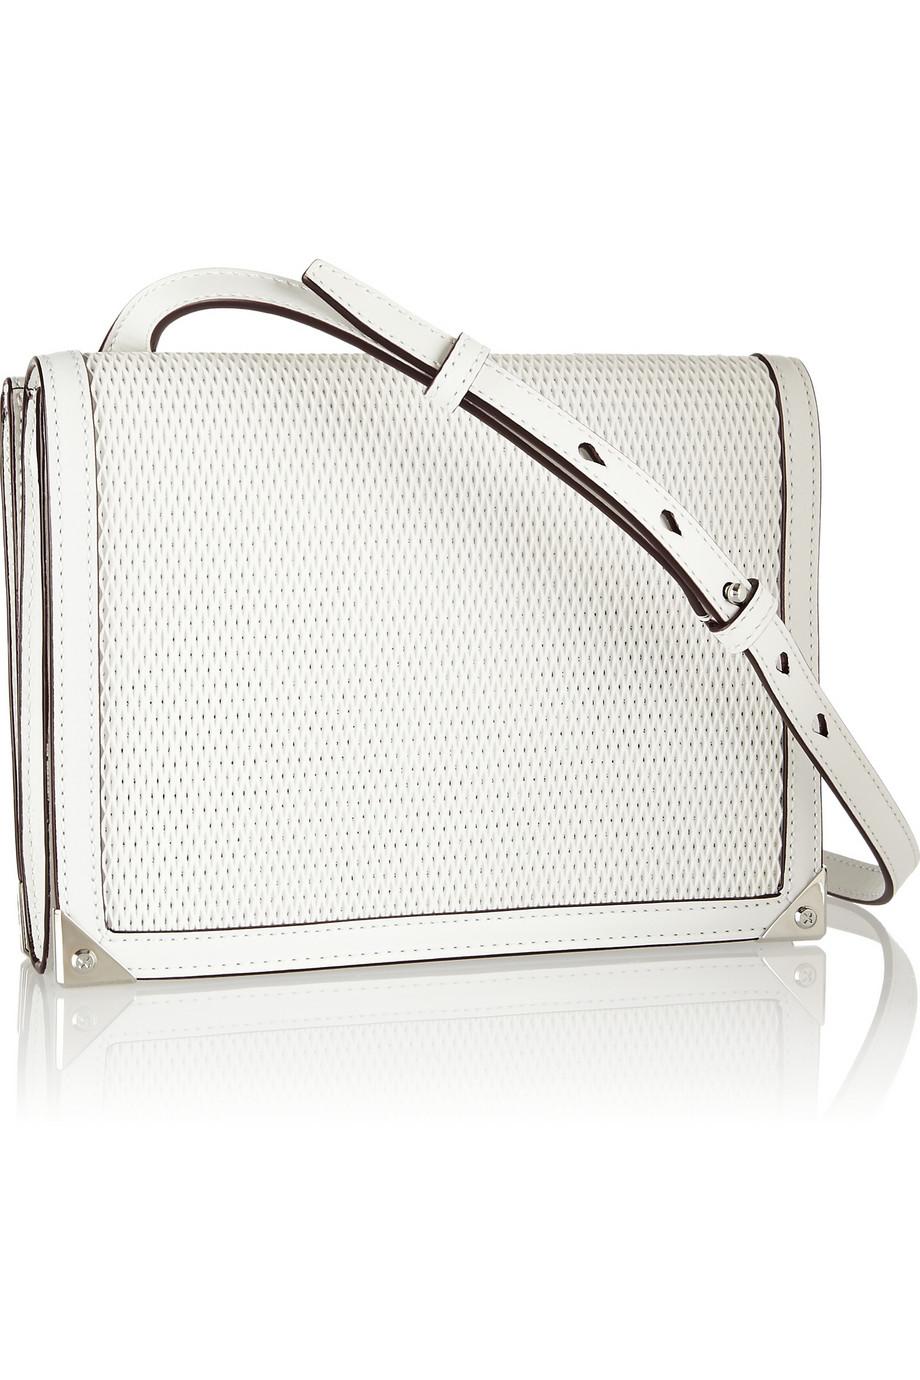 Alexander Wang Prisma Double Envelope mesh-effect leather shoulder bag – 57% at THE OUTNET.COM